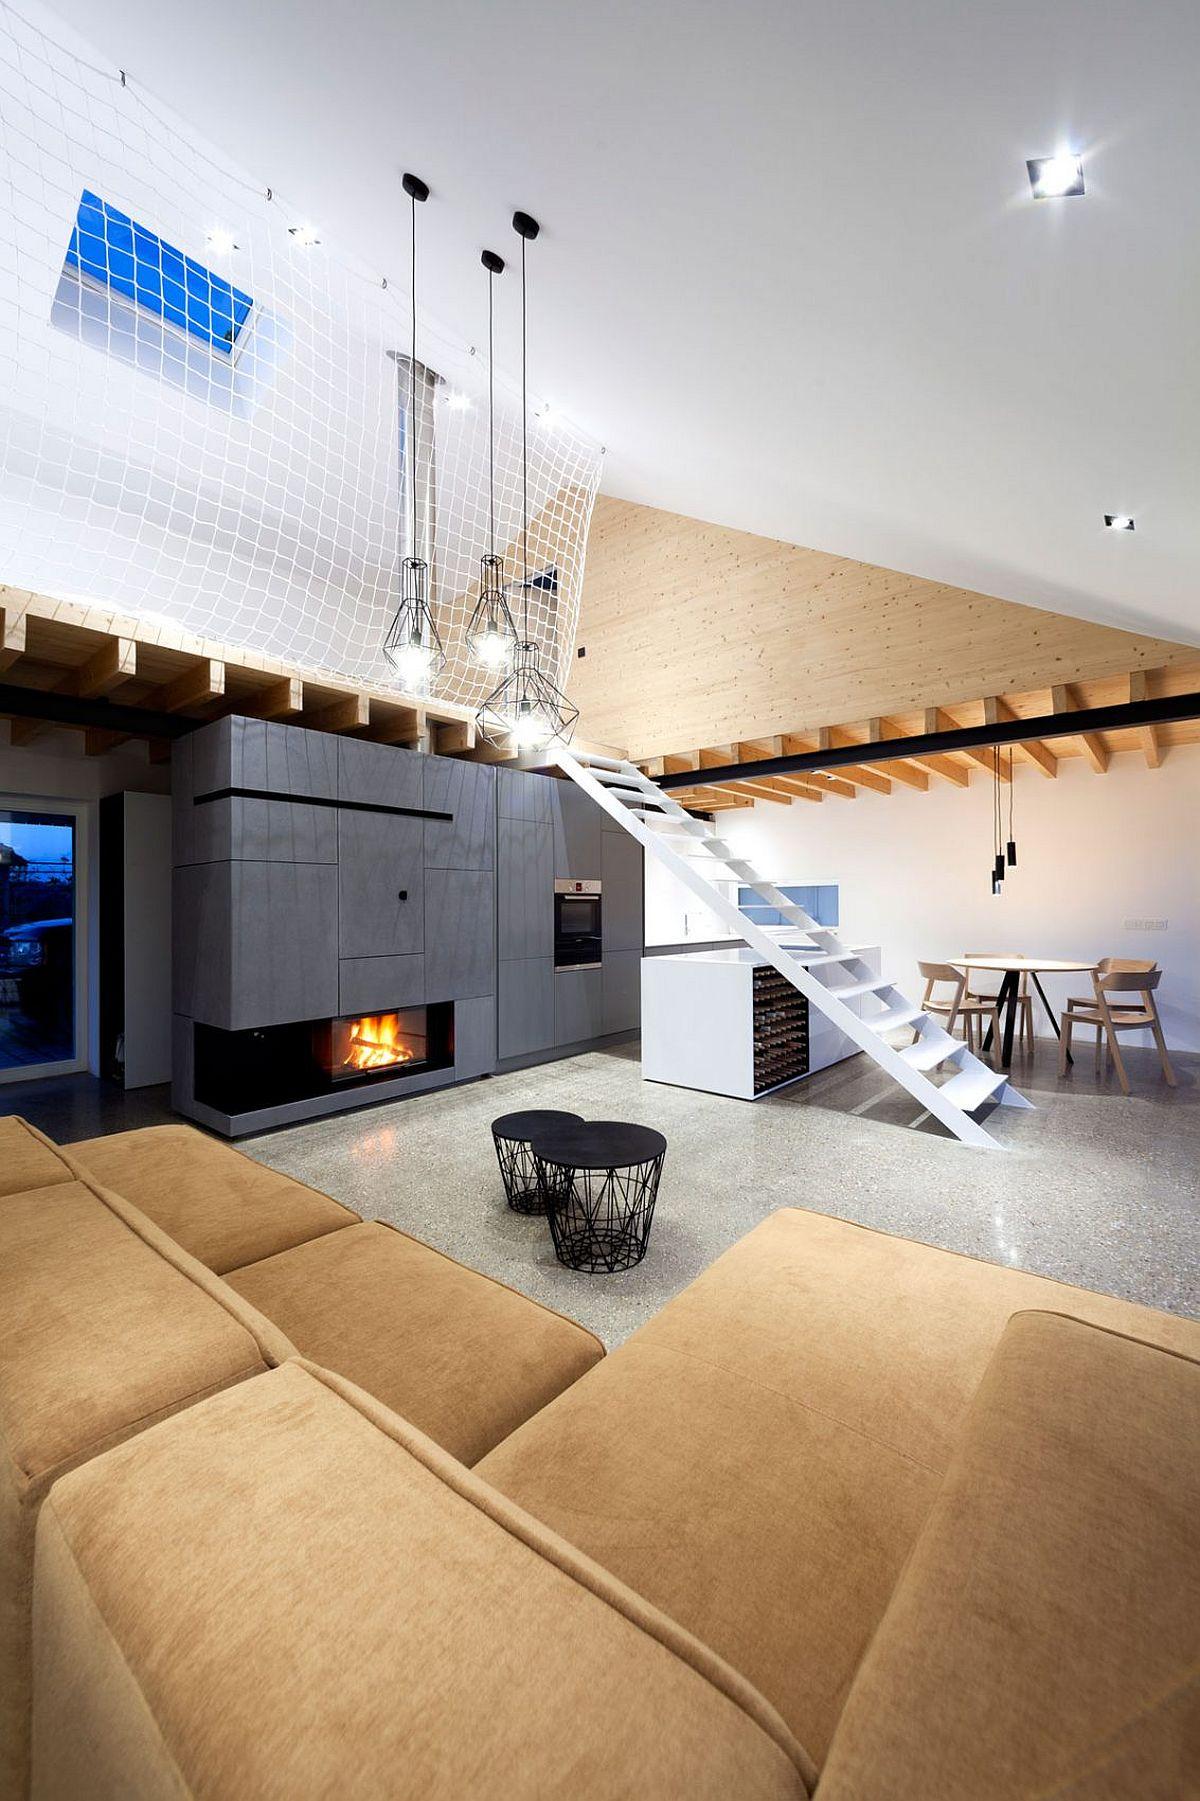 Loft style interior of the Slovakian home with mezzanine level